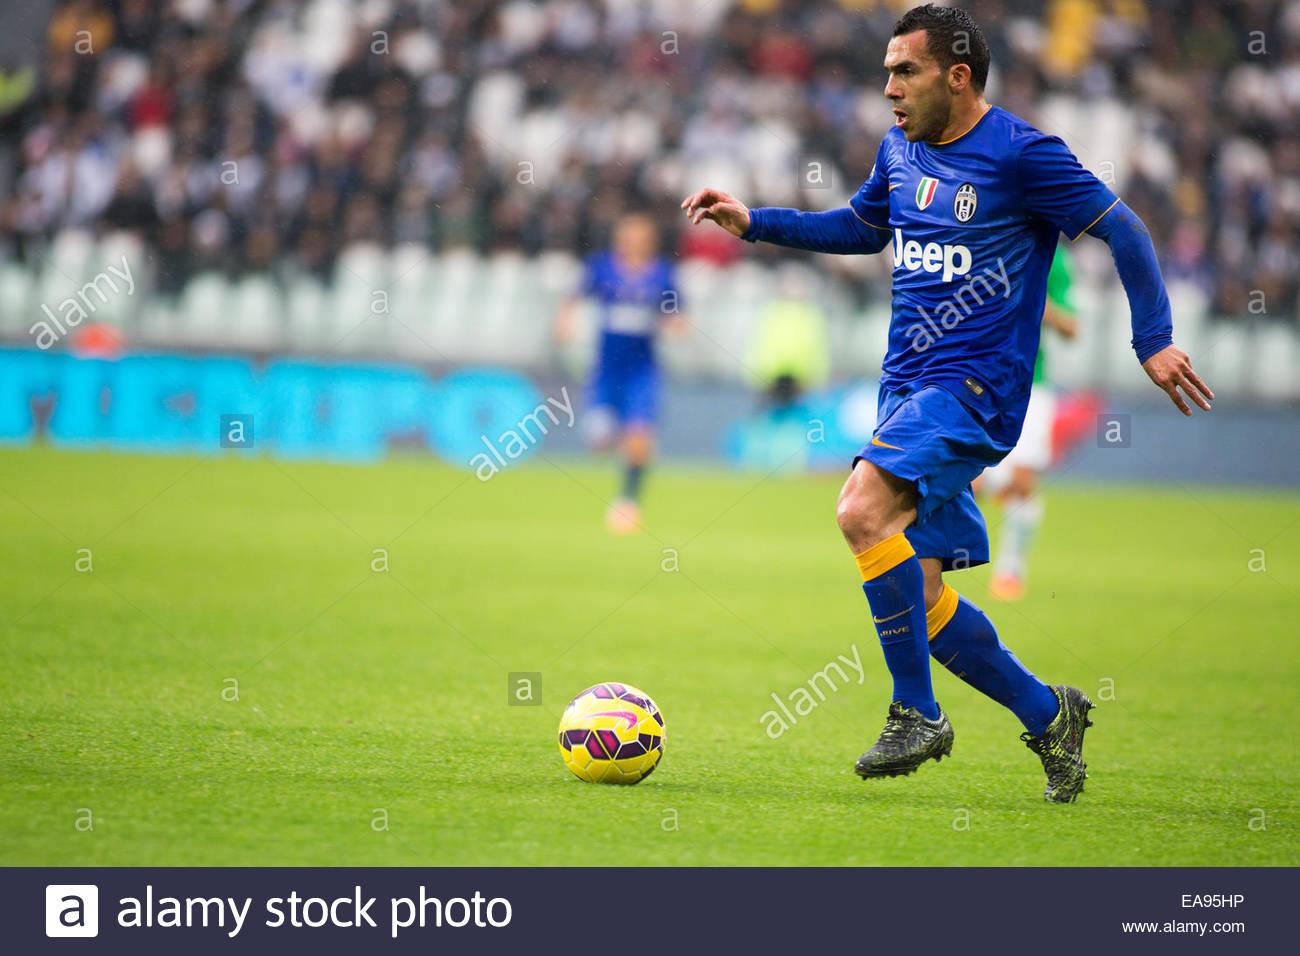 9bf5d2bc719 Carlos Tevez during the Serie A match between Juventus FC and Parma FC. at  Juventus Stafium on november 9